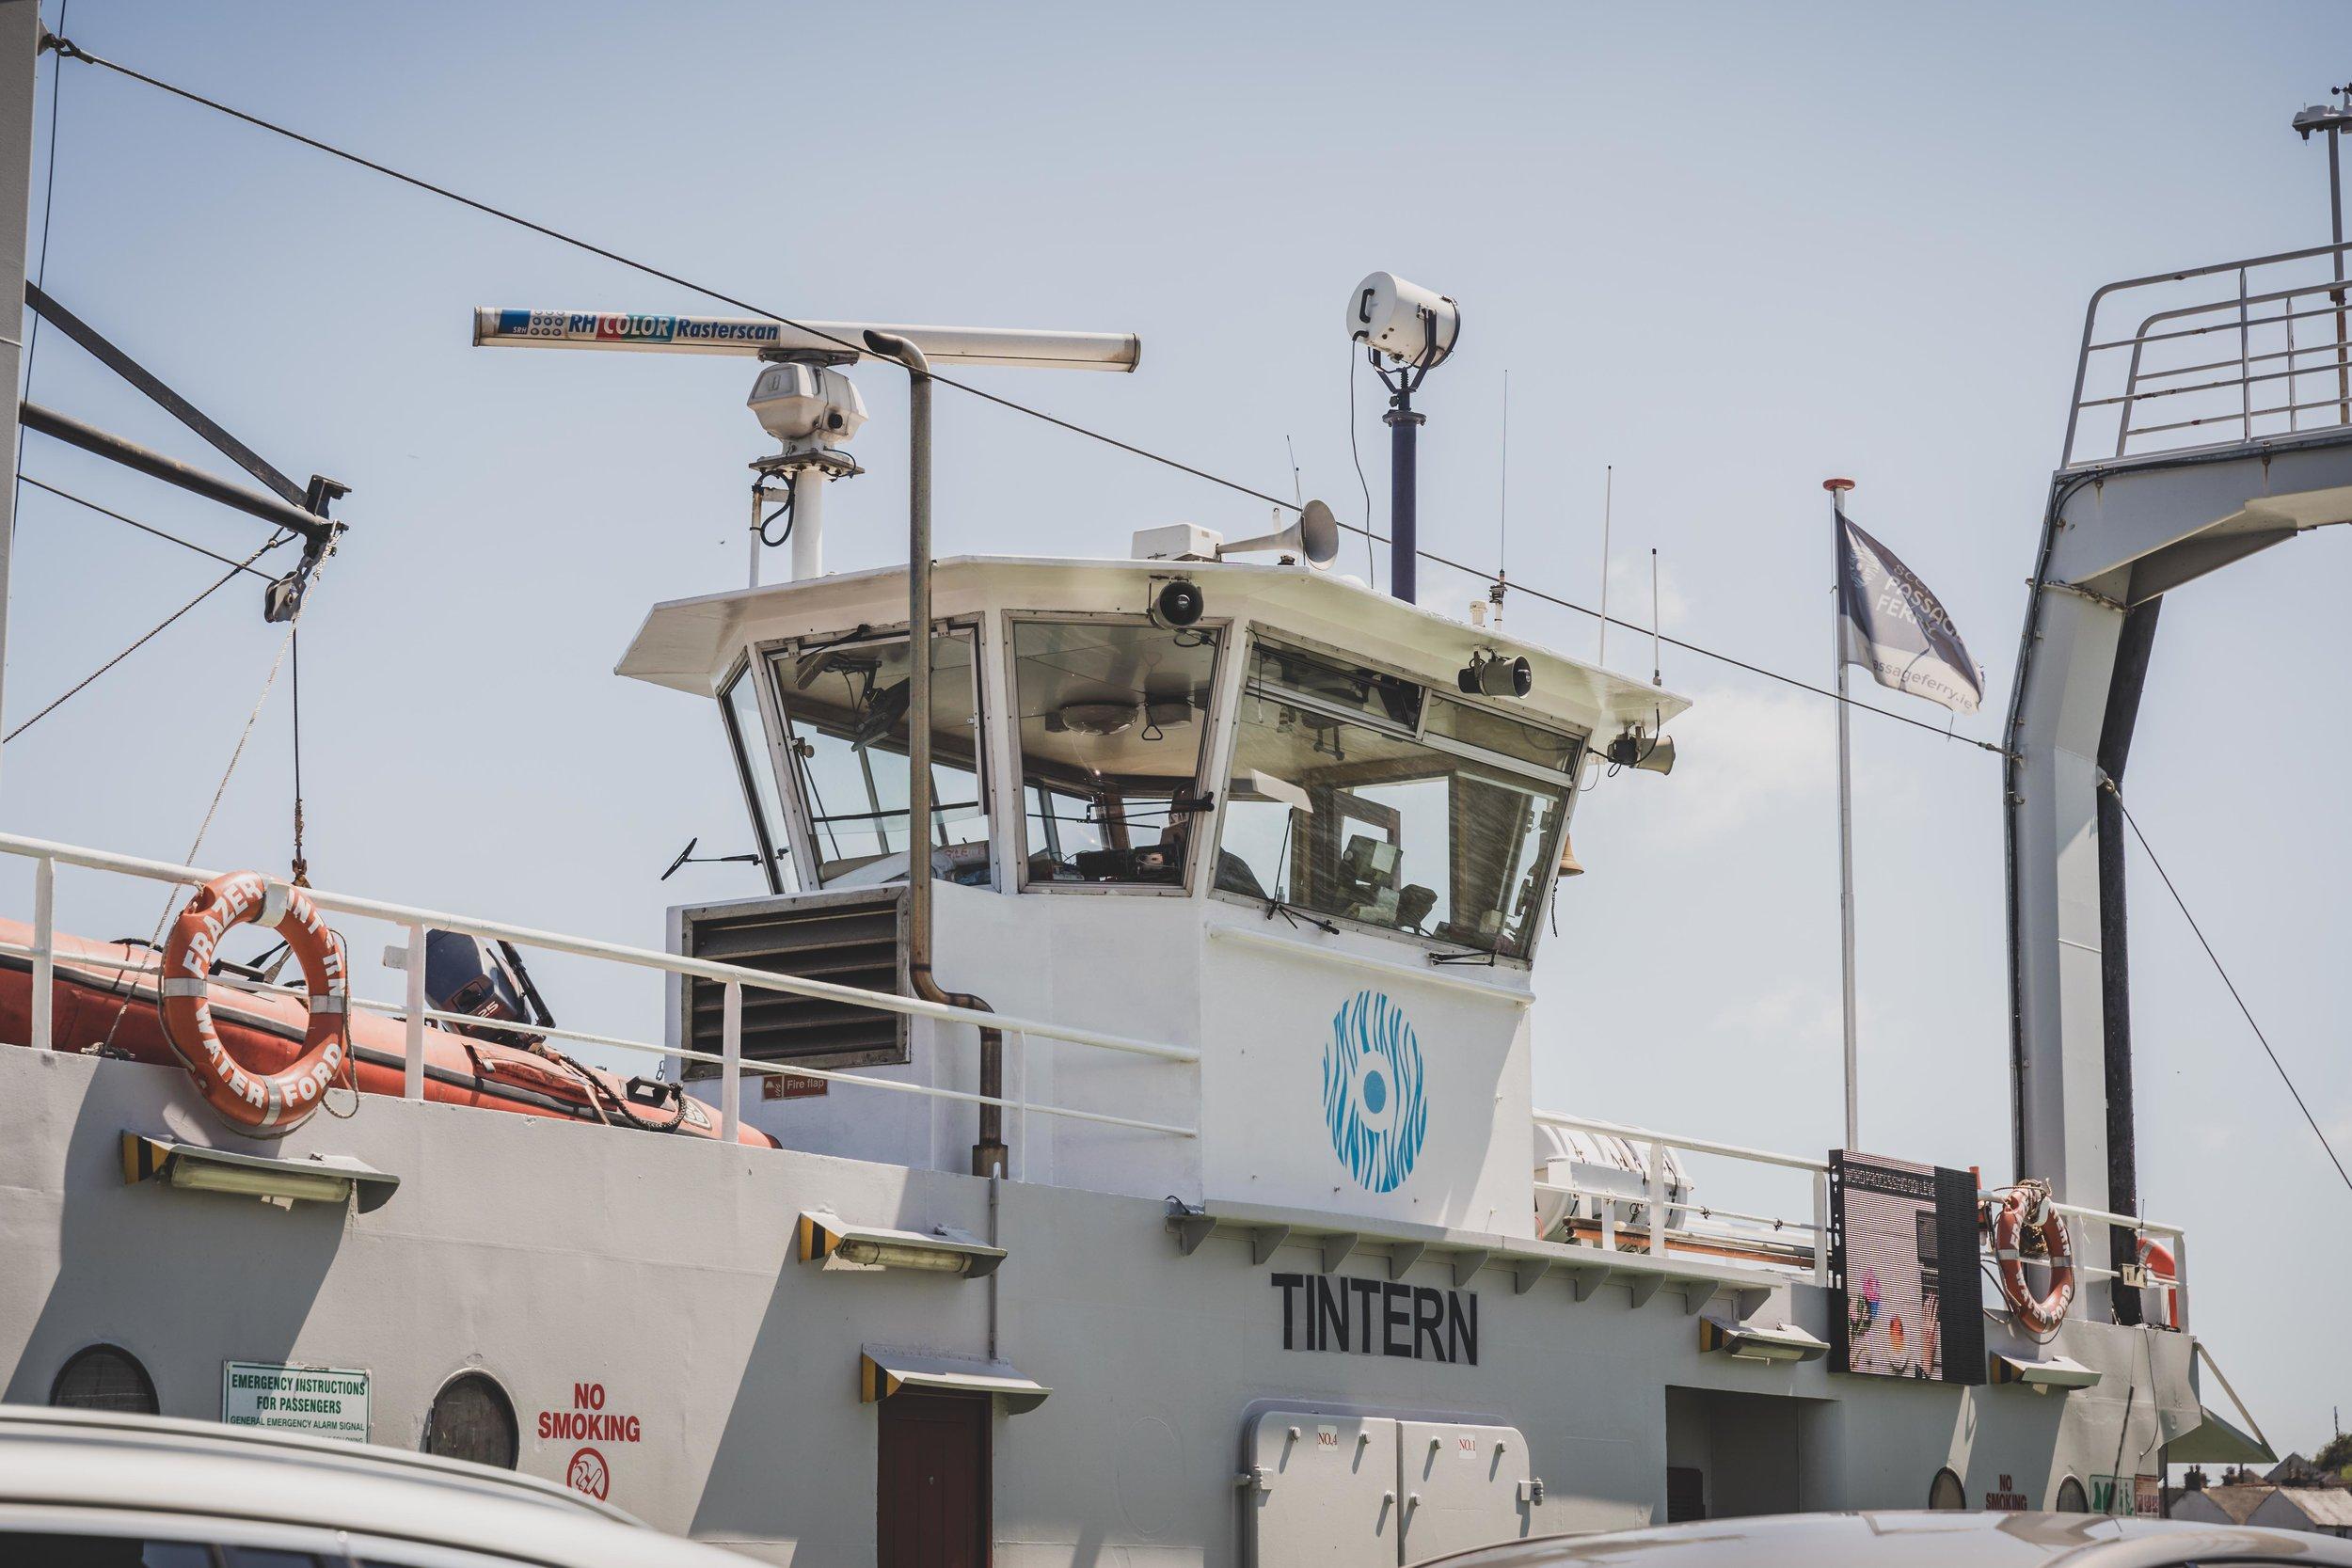 ballyhack passage east ferry ship .jpg